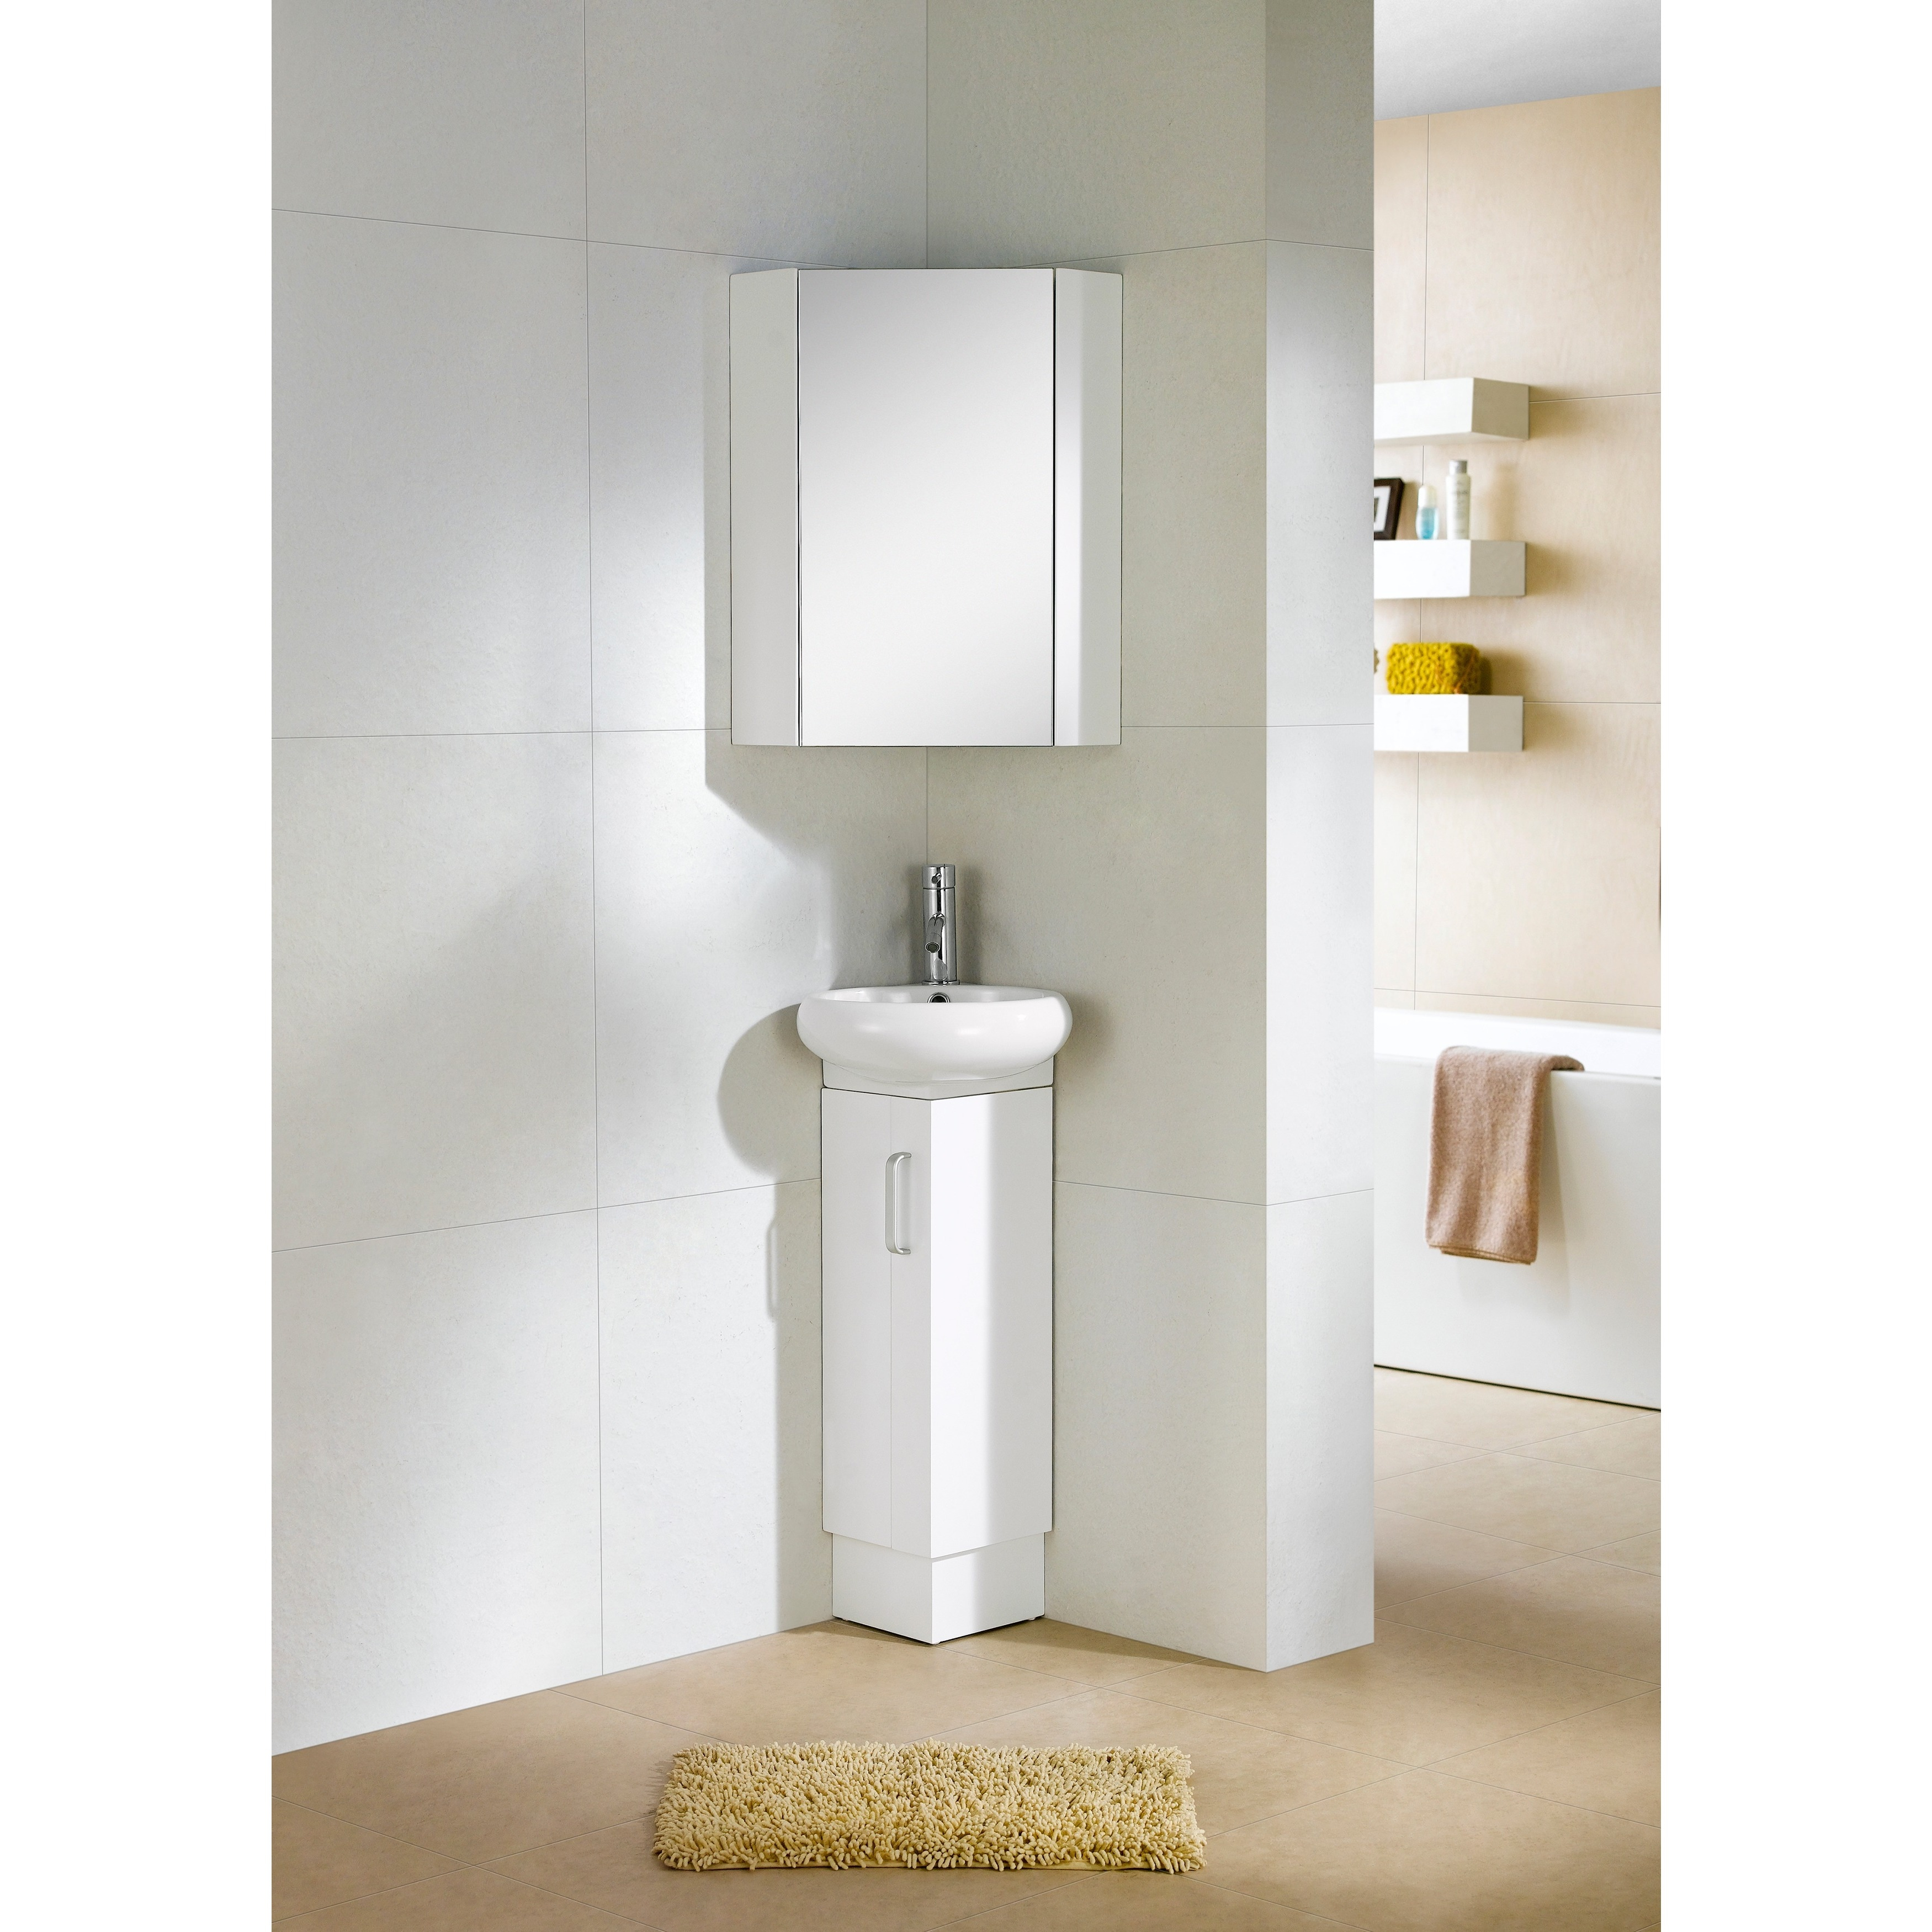 Fine Fixtures Milan Wood White Small Corner Bathroom Vani...